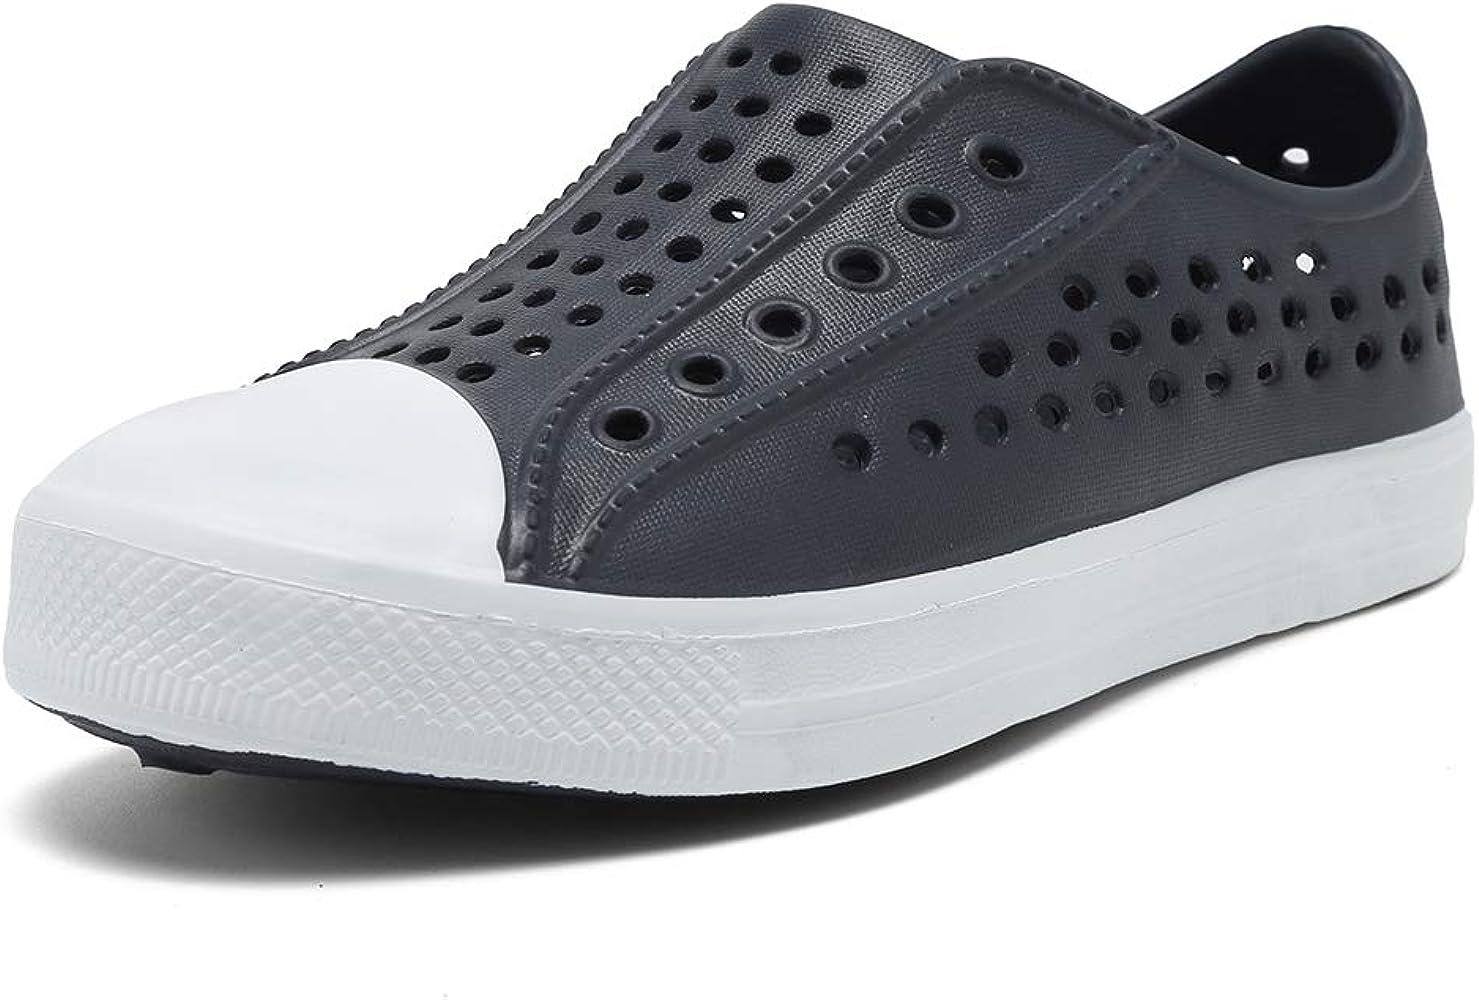 seannel Kids Slip-On Toddler Sneaker Lightweight/Breathable Sandal Water Shoes Outdoor /& Indoor